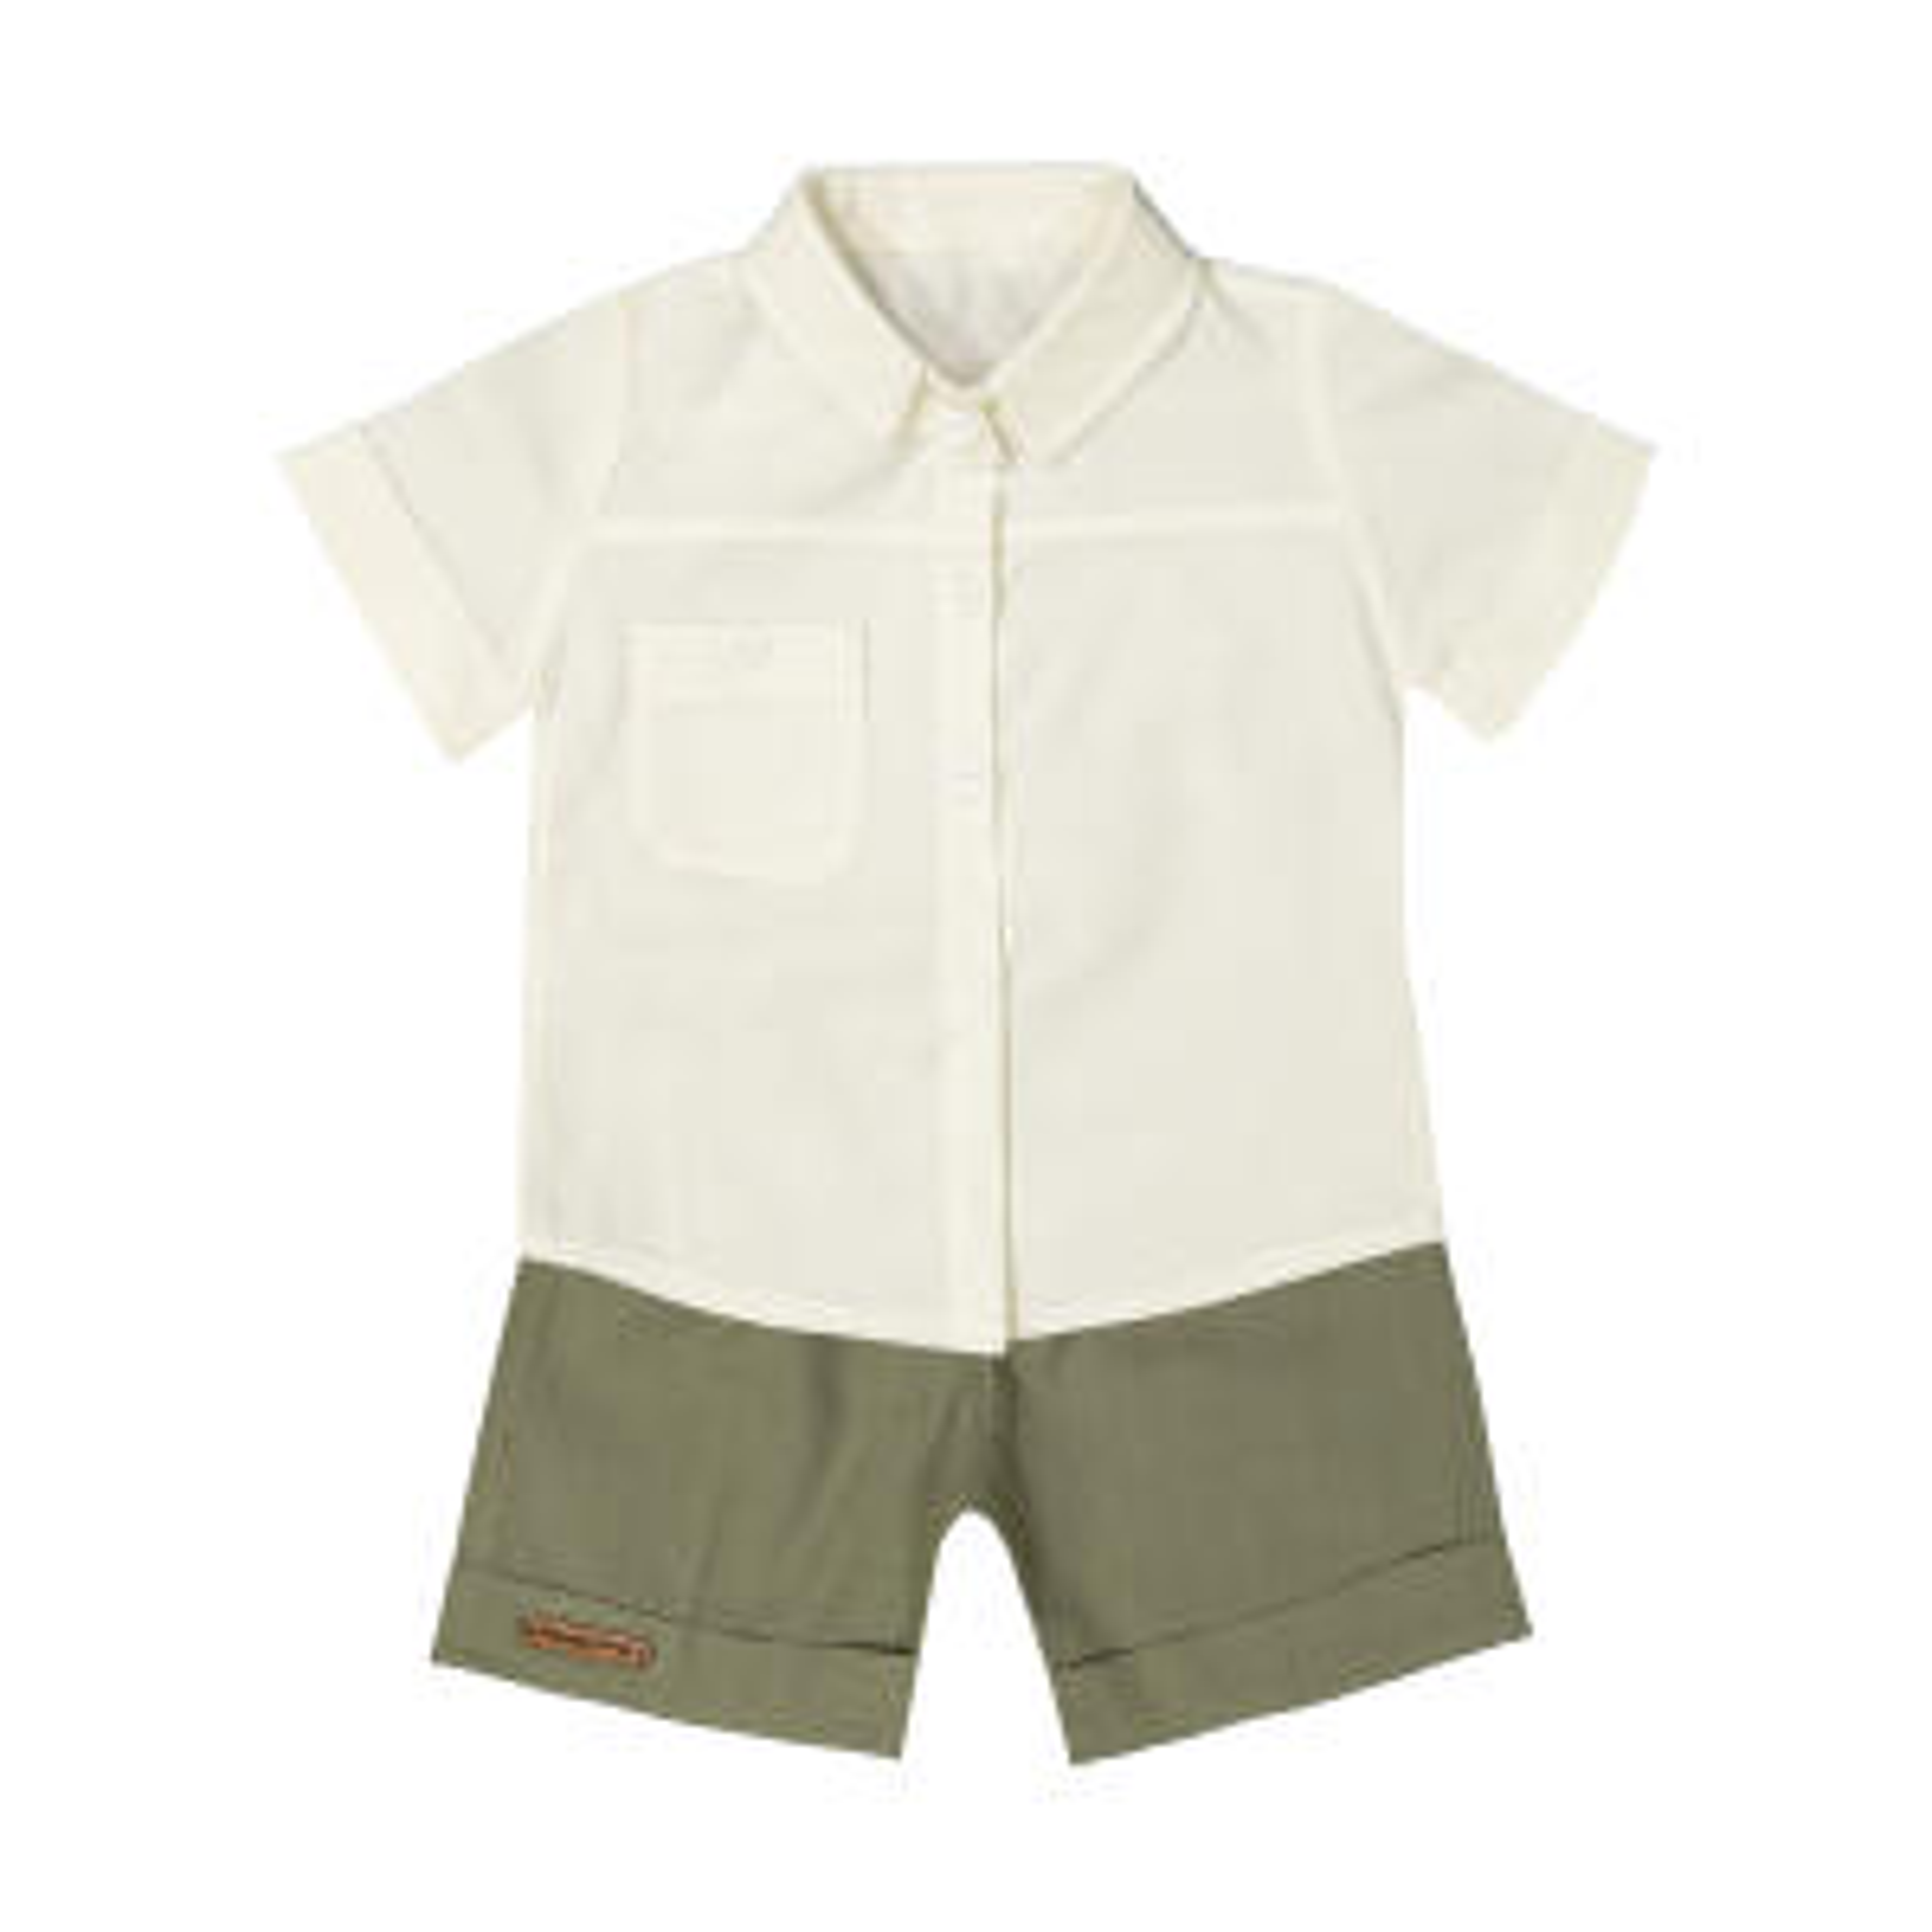 ست پیراهن و شلوارک نوزادی پسرانه ماناپوش کد 1024